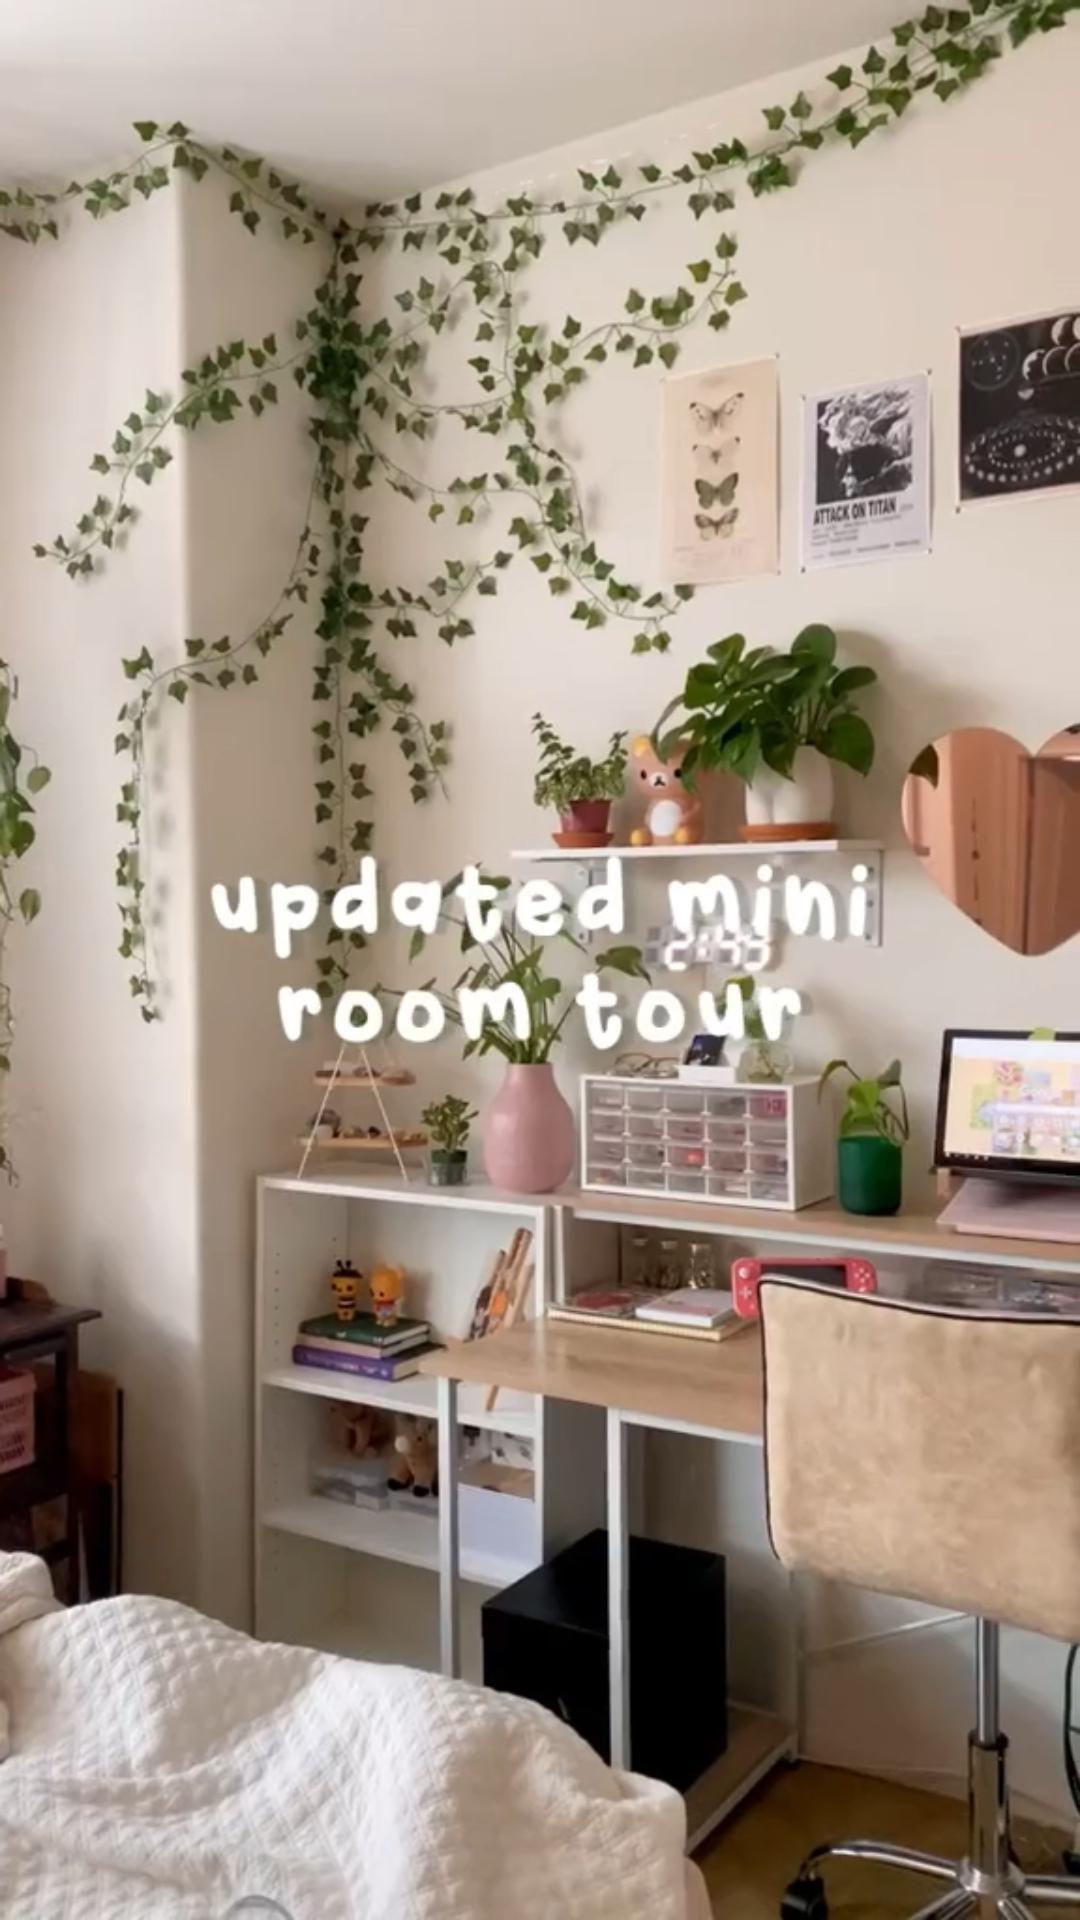 Aesthetic mini room tour